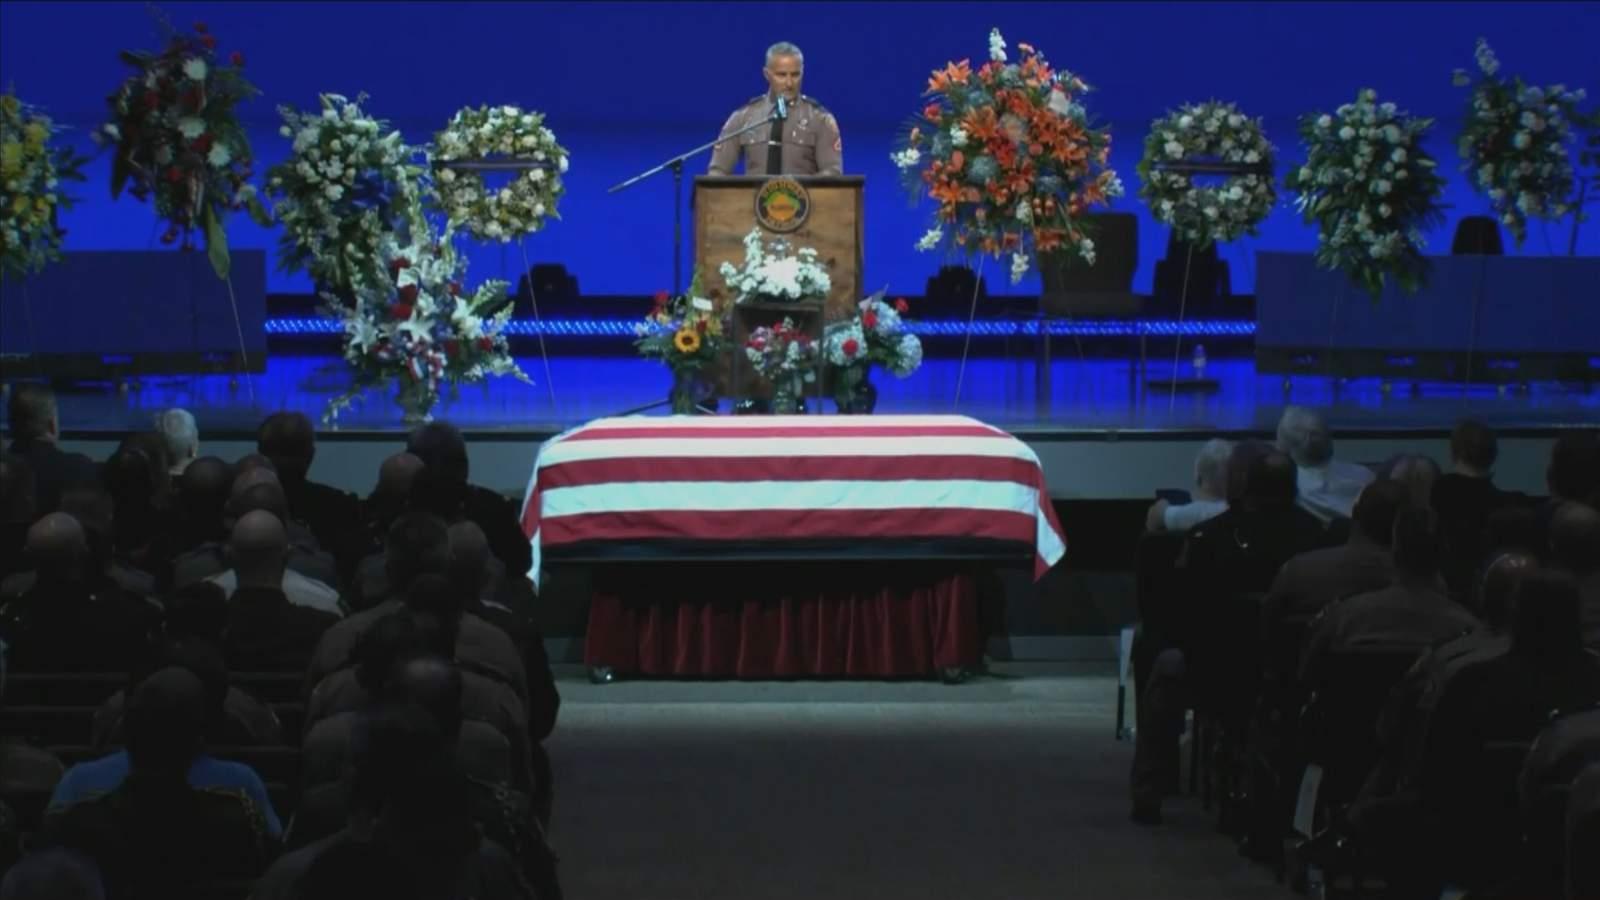 Memorial service held for trooper fatally shot on I-95